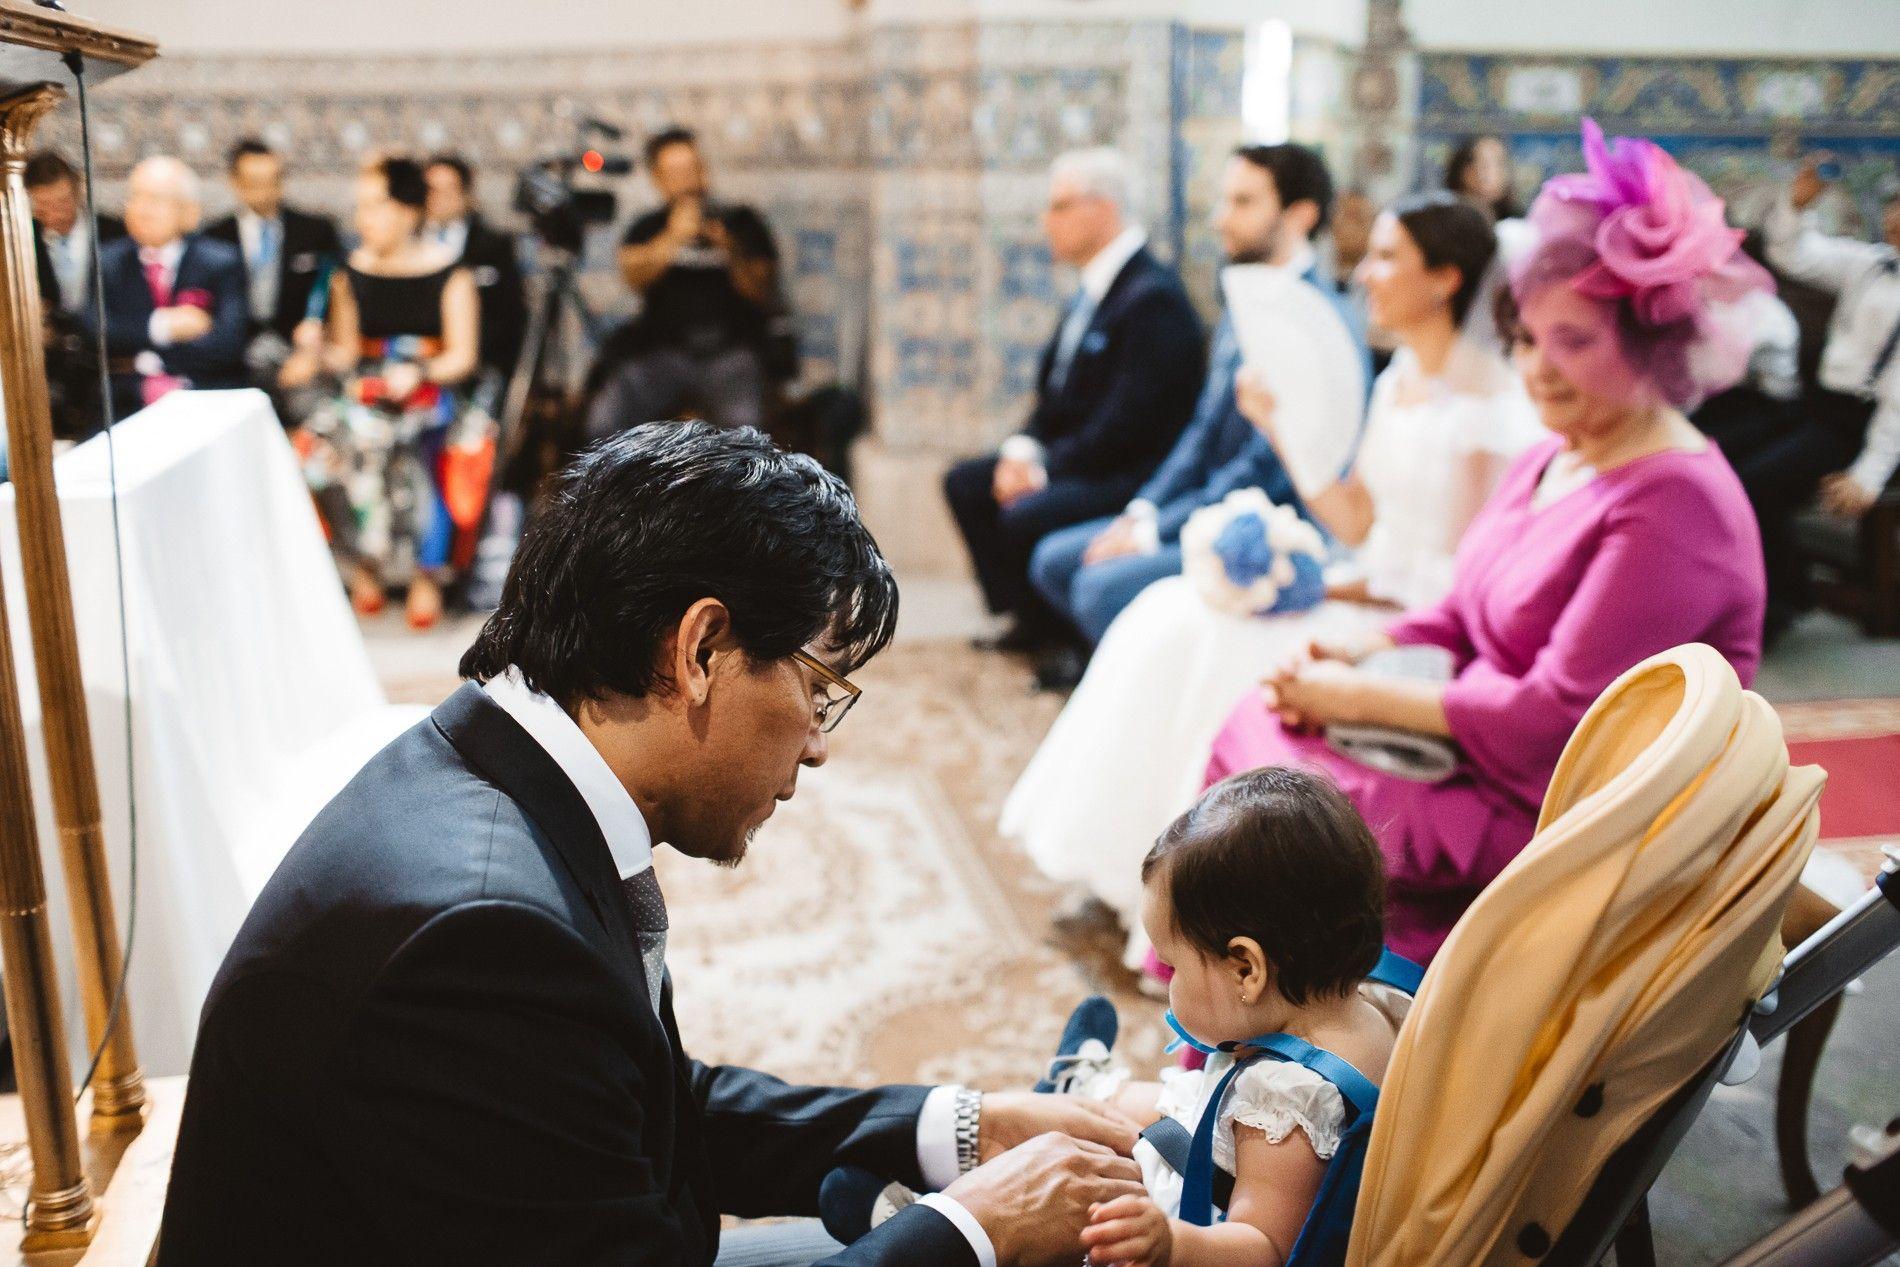 fotografo-de-boda-plasencia-18